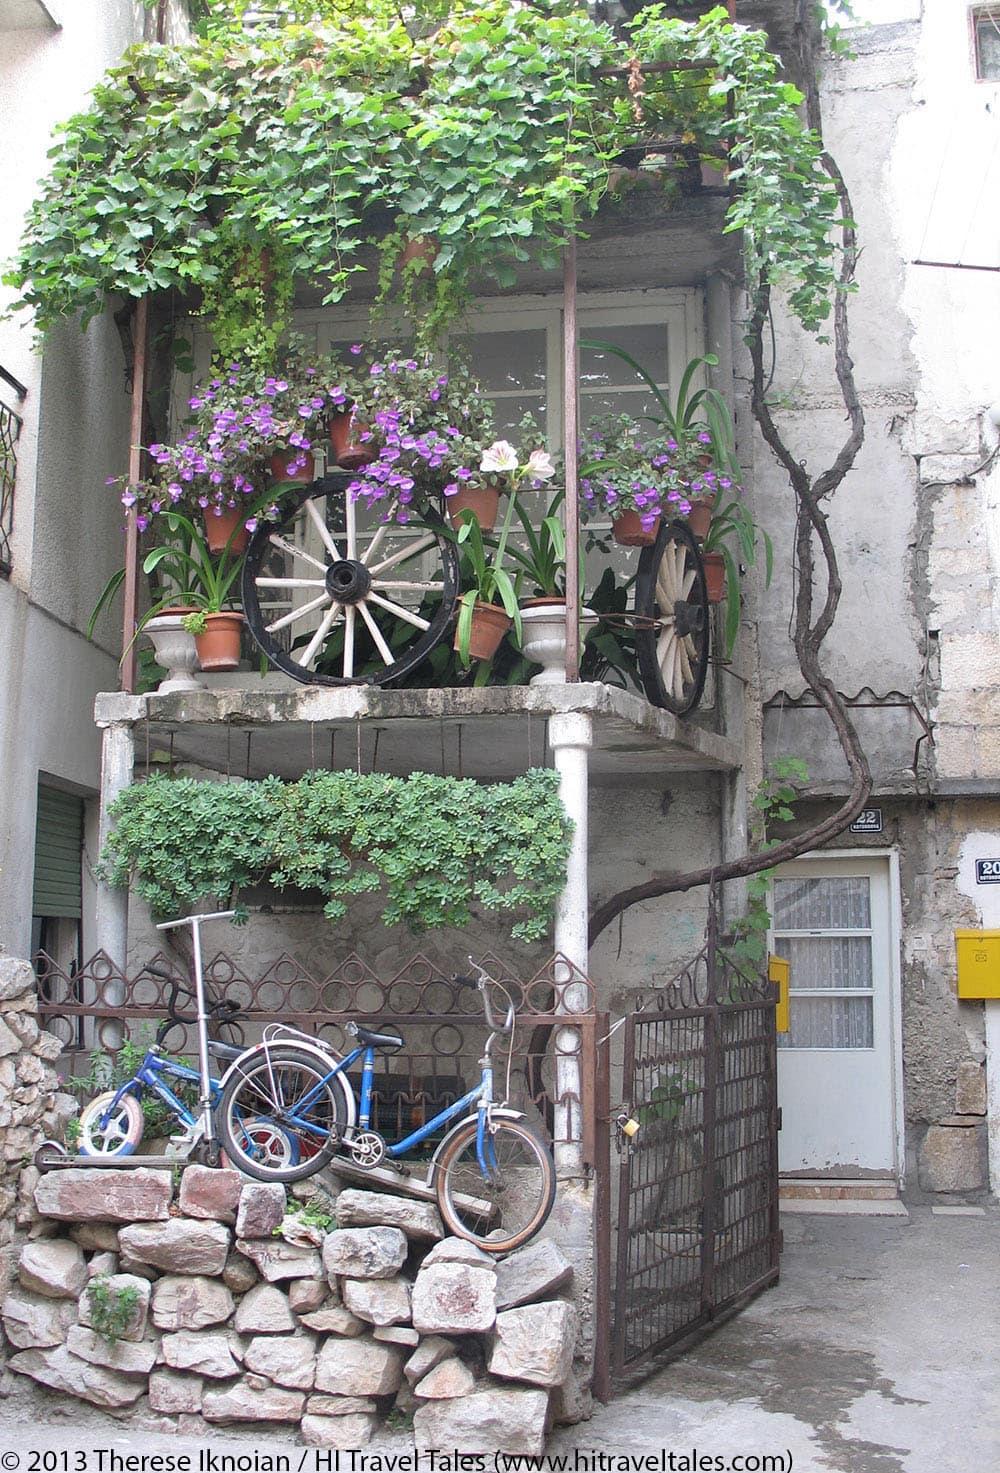 fun and funny photos - bikes outside a home in Croatia